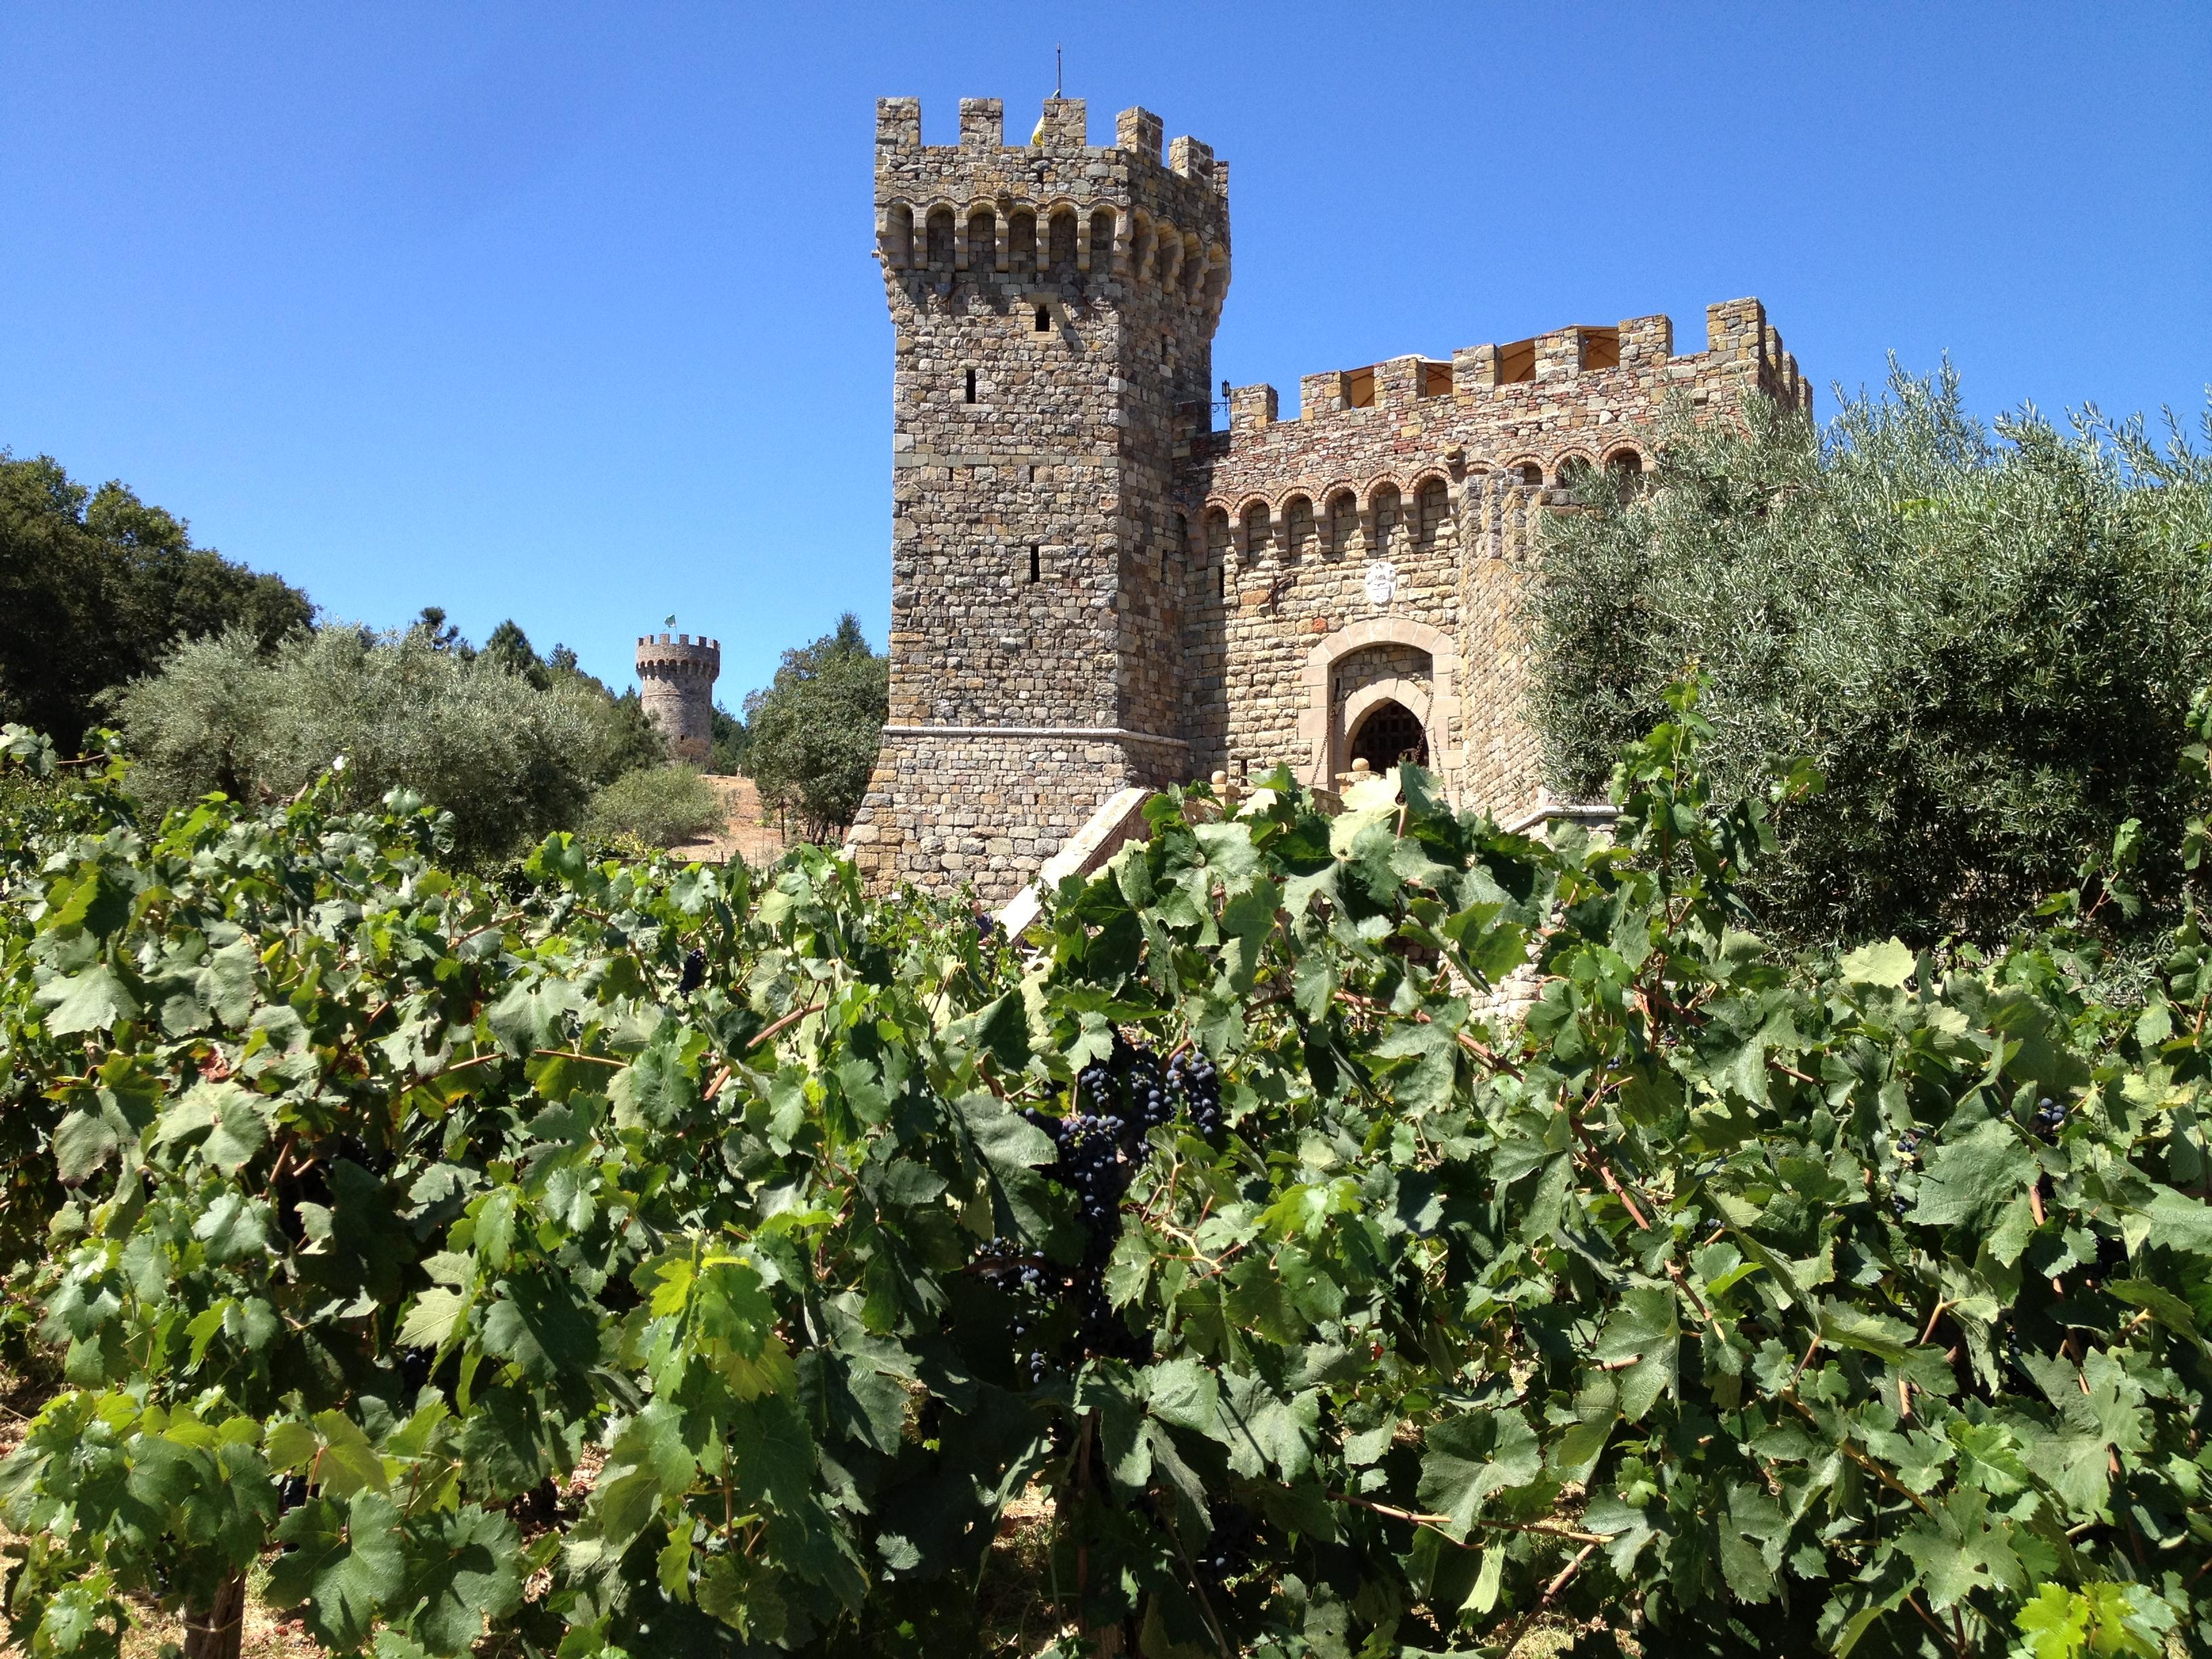 納帕酒鄉古堡酒莊:Castello di Amorosa in NAPA